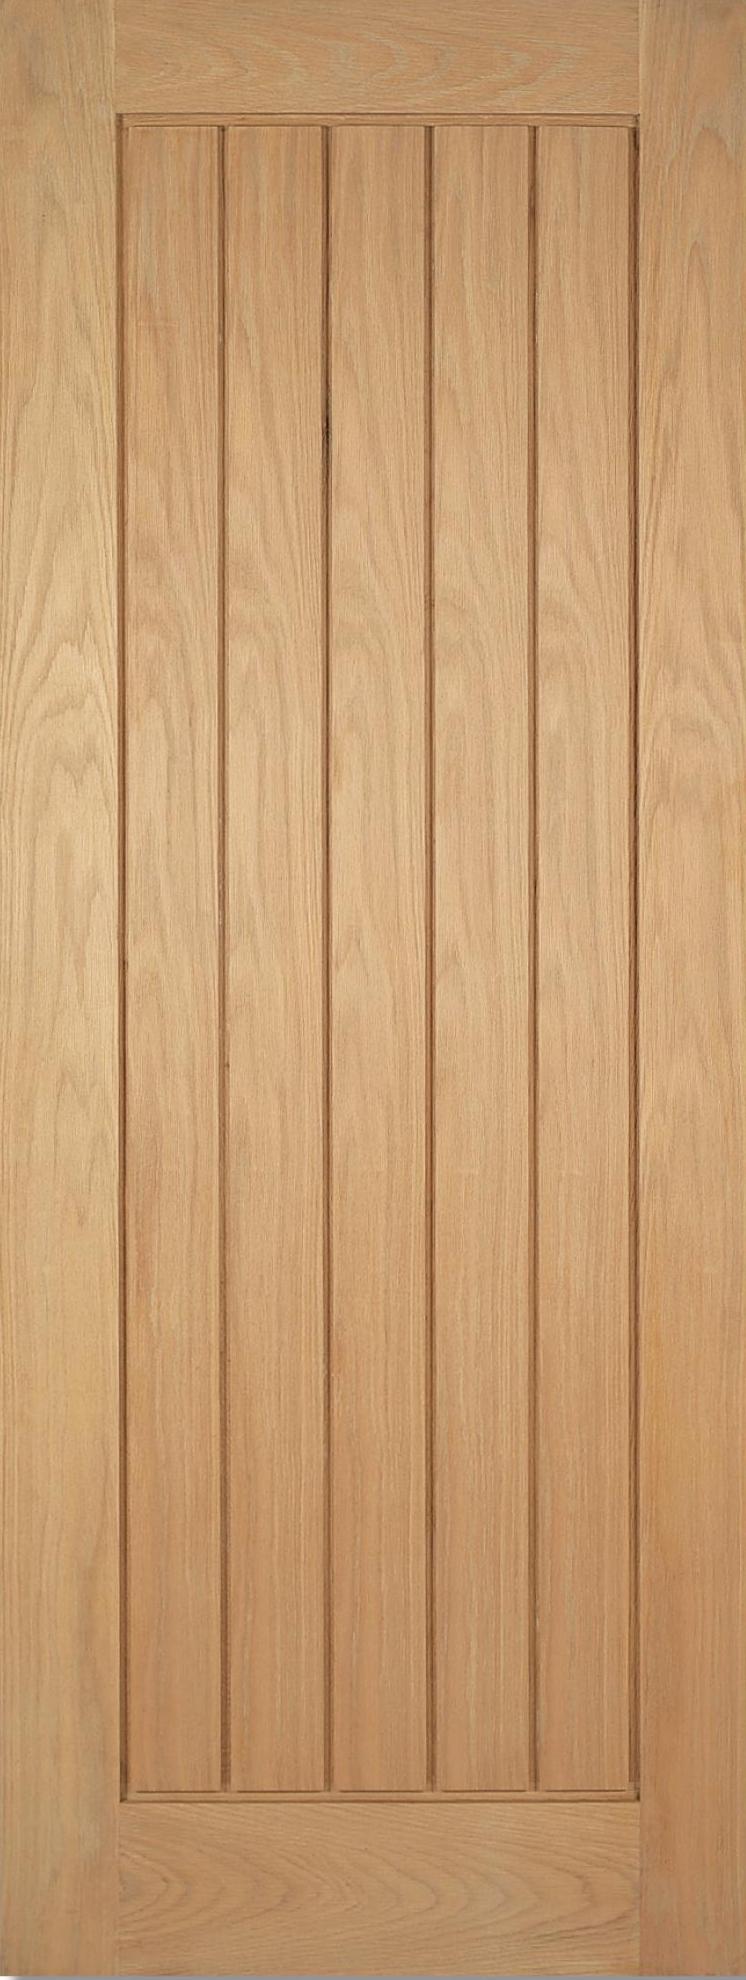 Mexicano Oak - Prefinished & Mexicana Oak Internal Door Mexicano Oak Prefinished Interior Doors ...